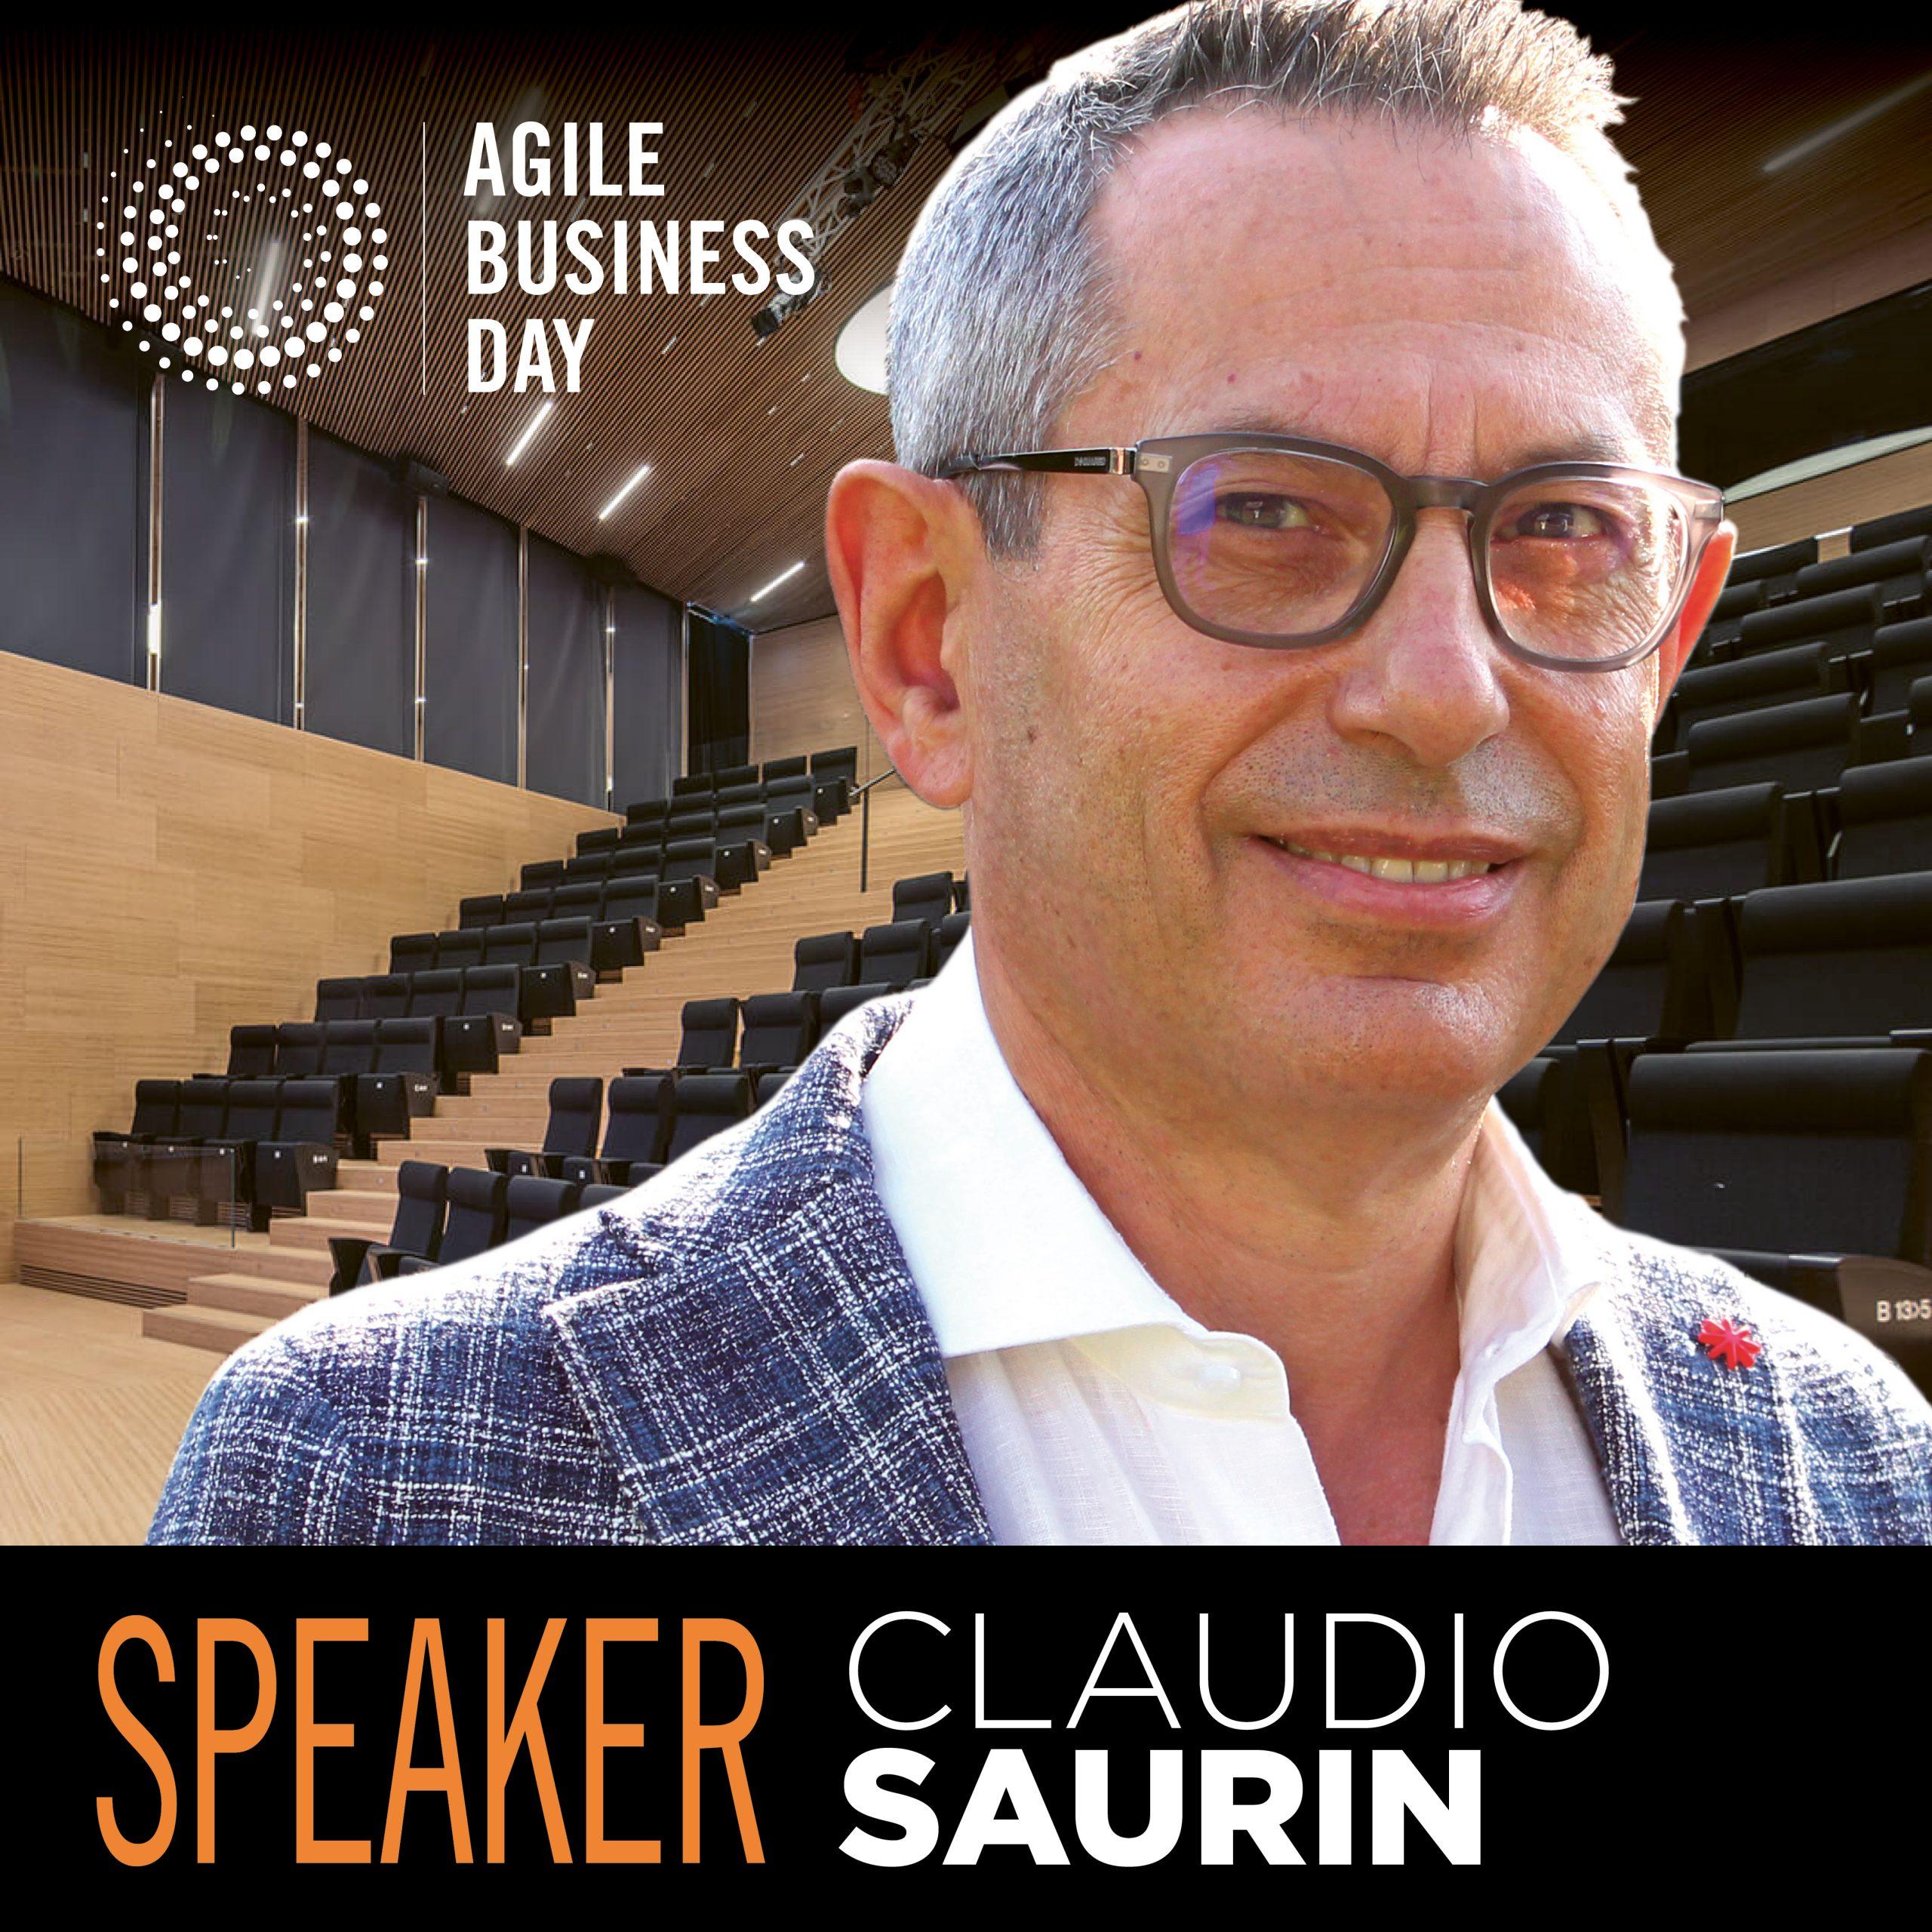 #ABD21 - Claudio Saurin